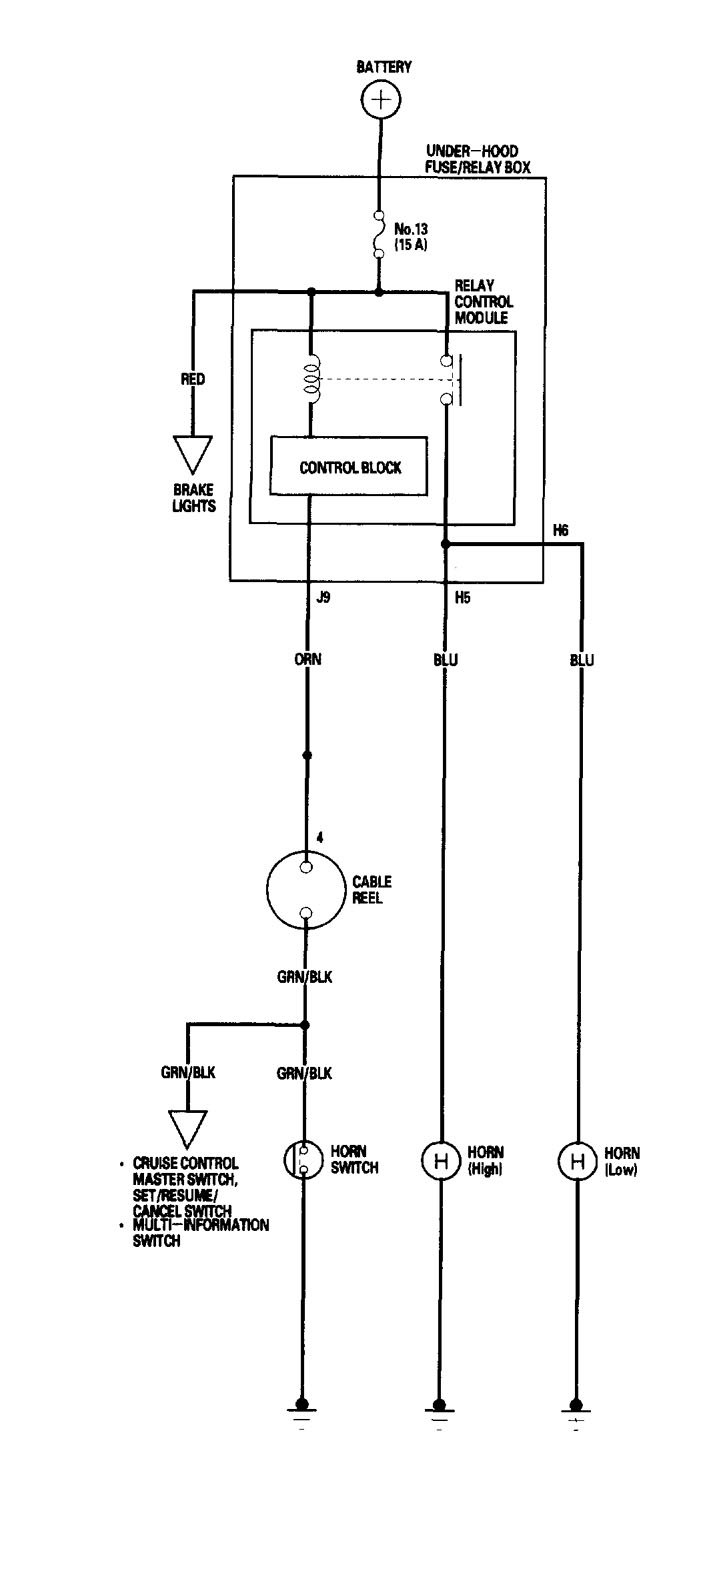 acura rl  2006  - wiring diagrams - horn